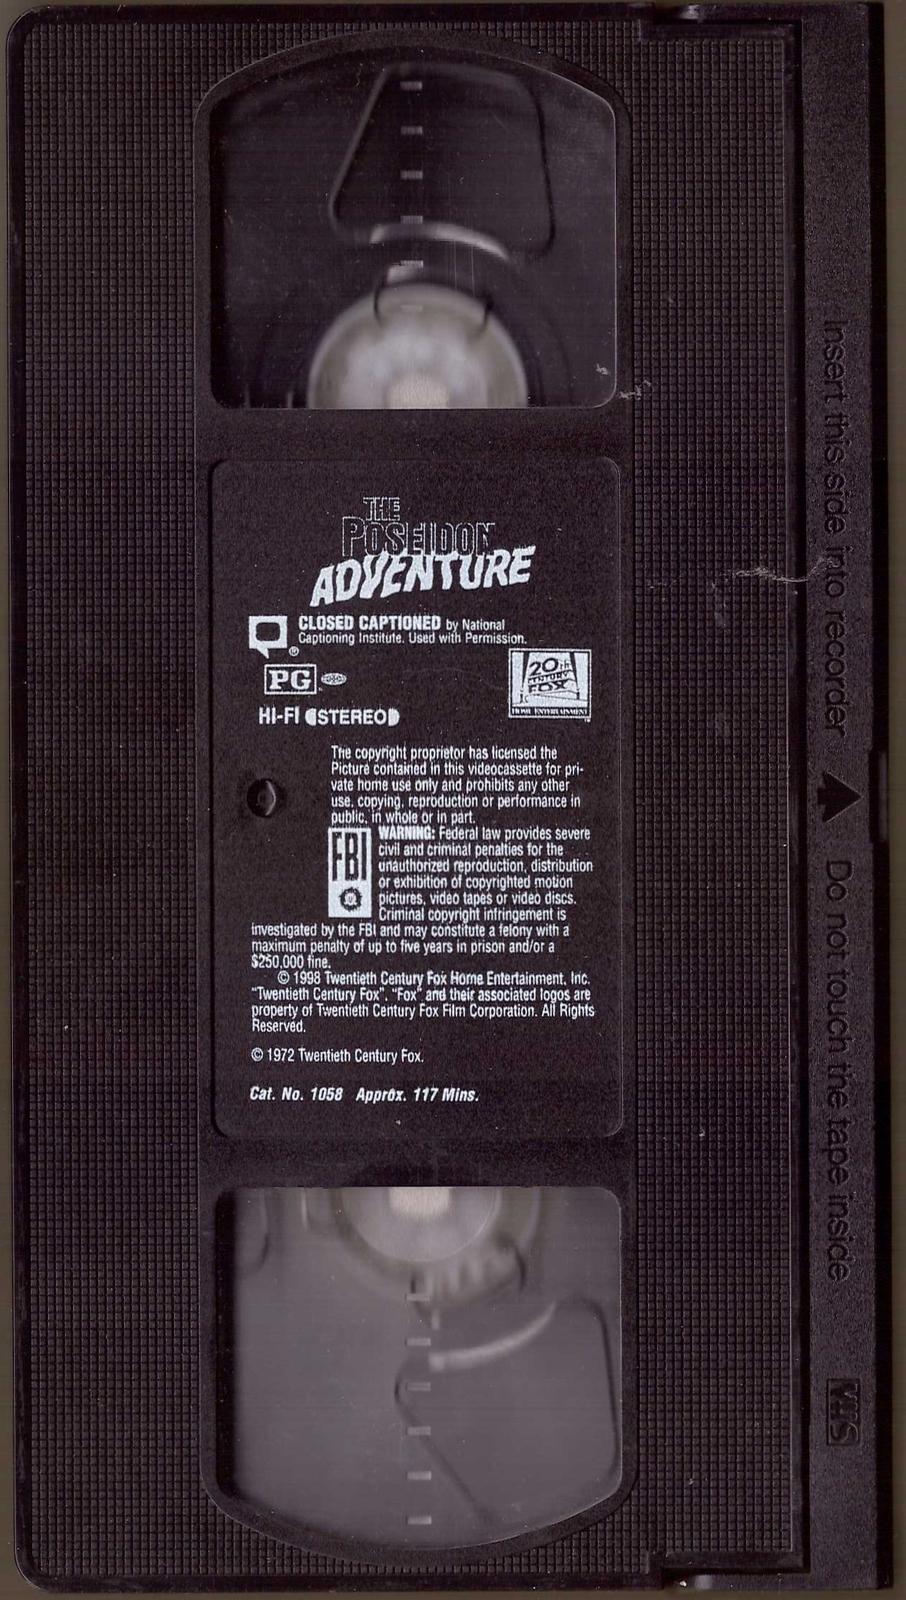 The Poseidon Adventure VHS Gene Hackman Ernest Borgnine Shelley Winters